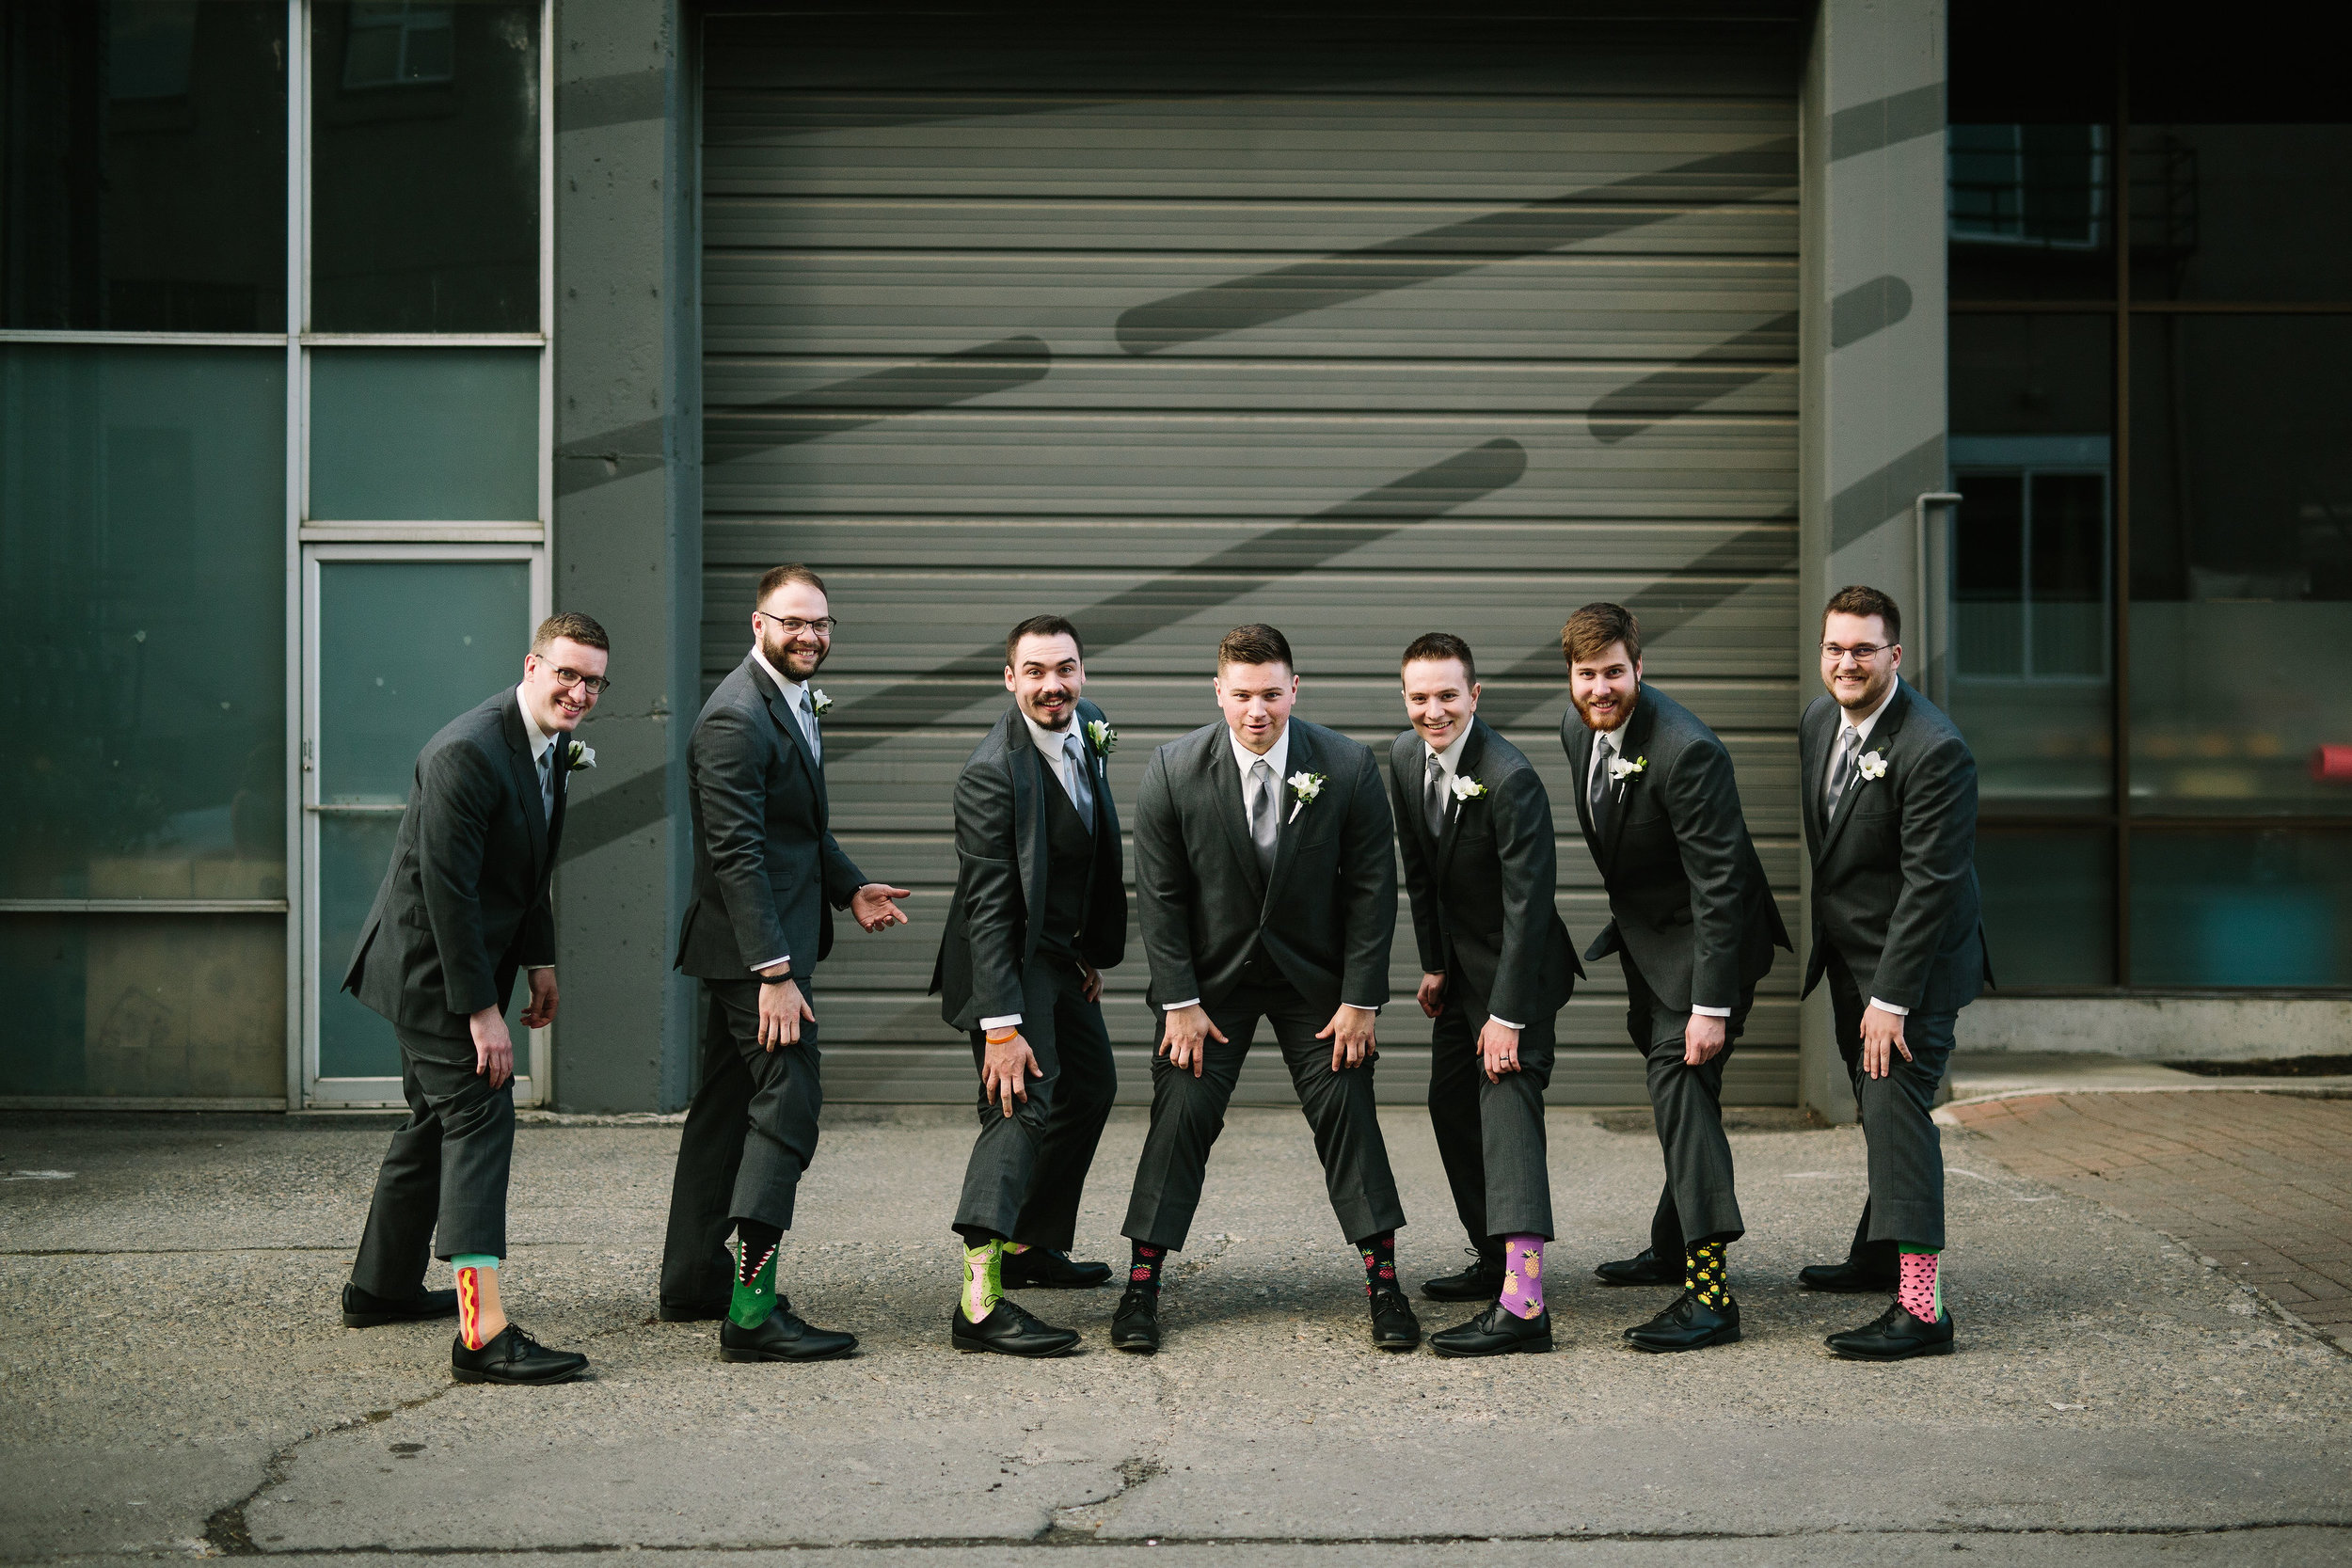 Fun Rustic spokane wedding groom and groomsmen showing off socks fun socks